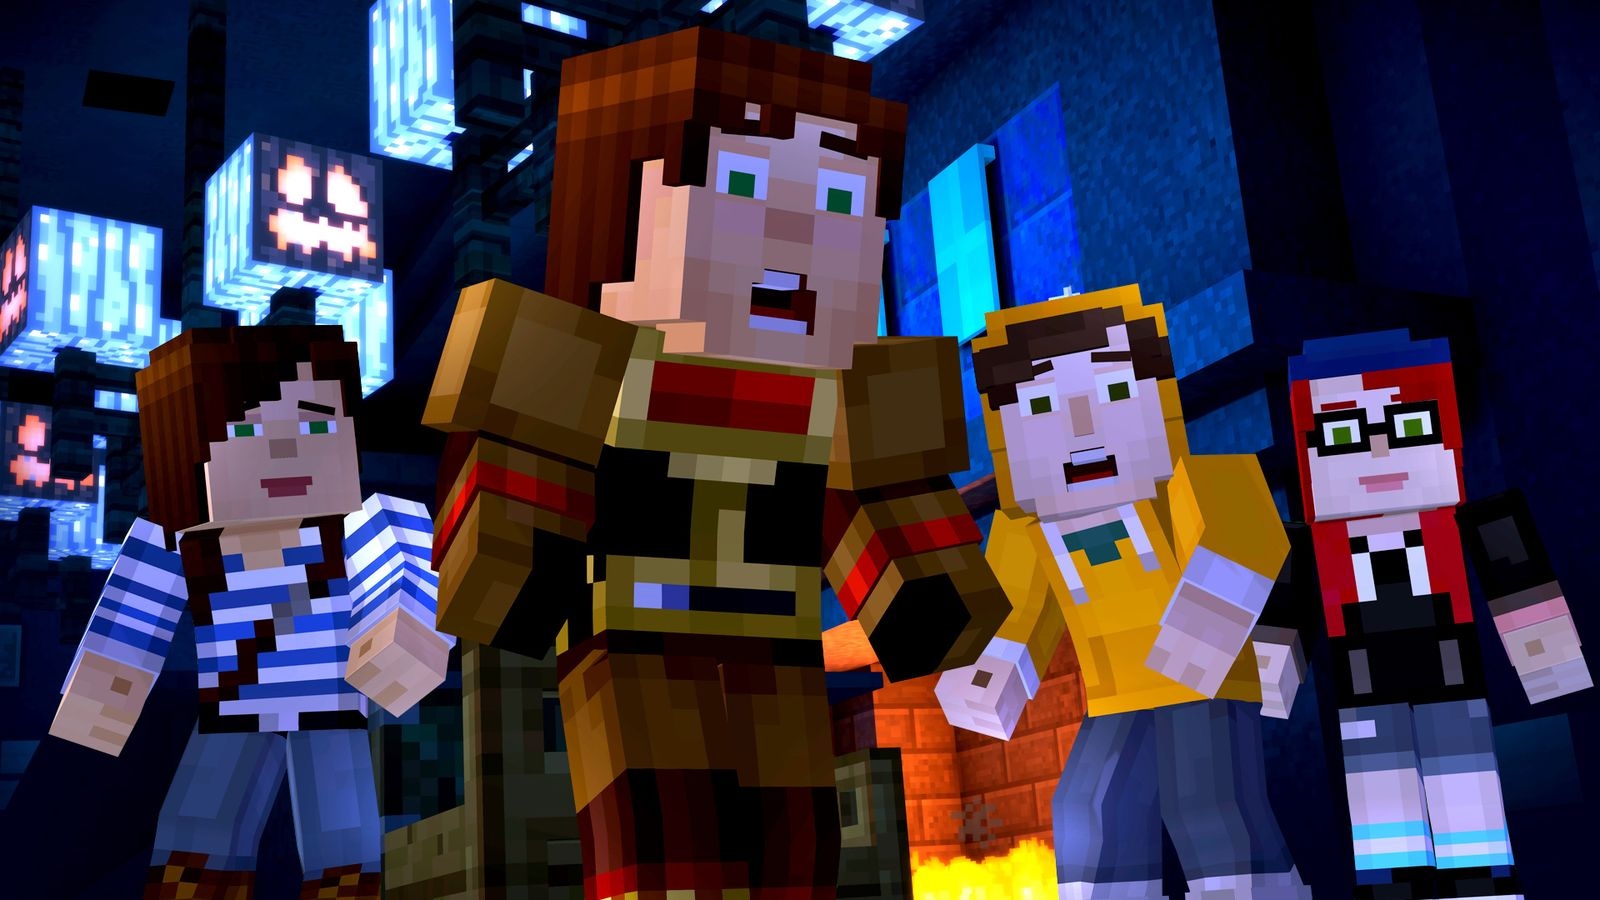 Minecraft: Story Mode Episode 6